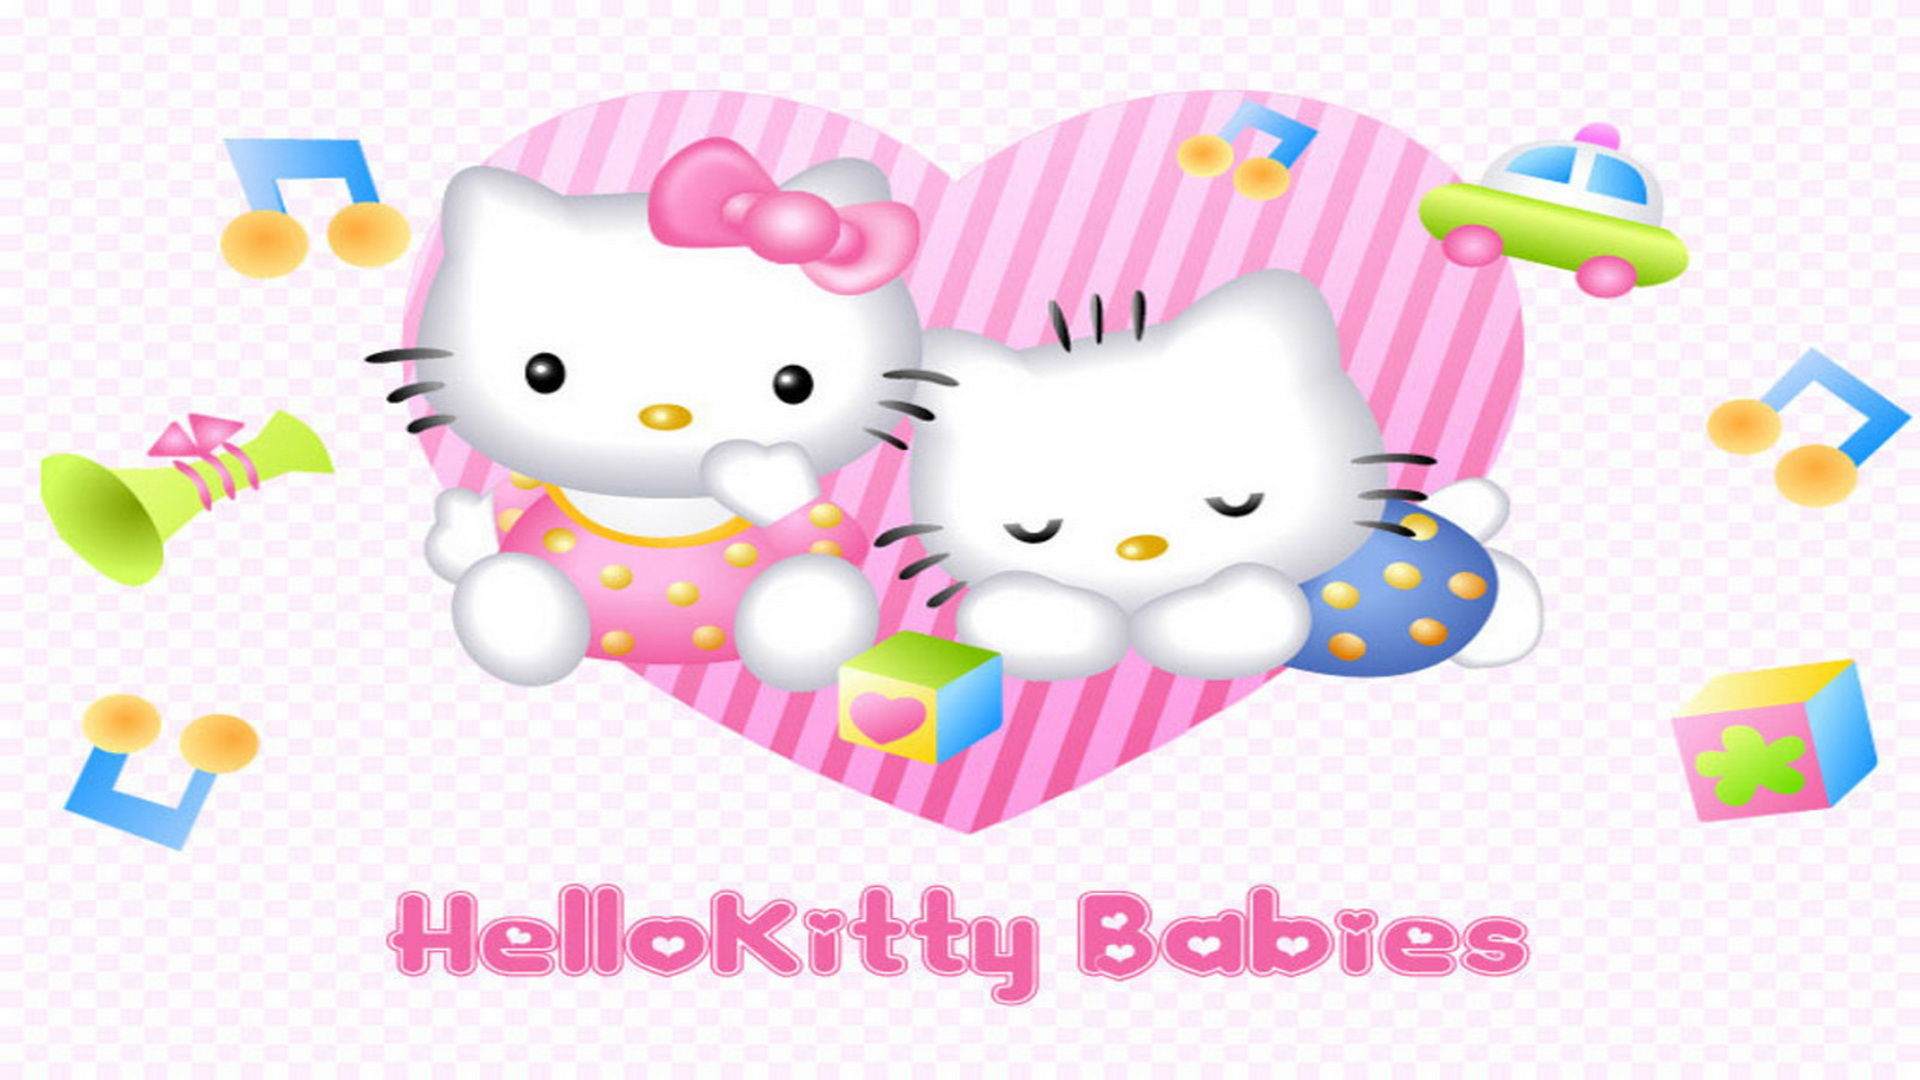 Source URL: http://imgpot.com/hello-kitty-babies/